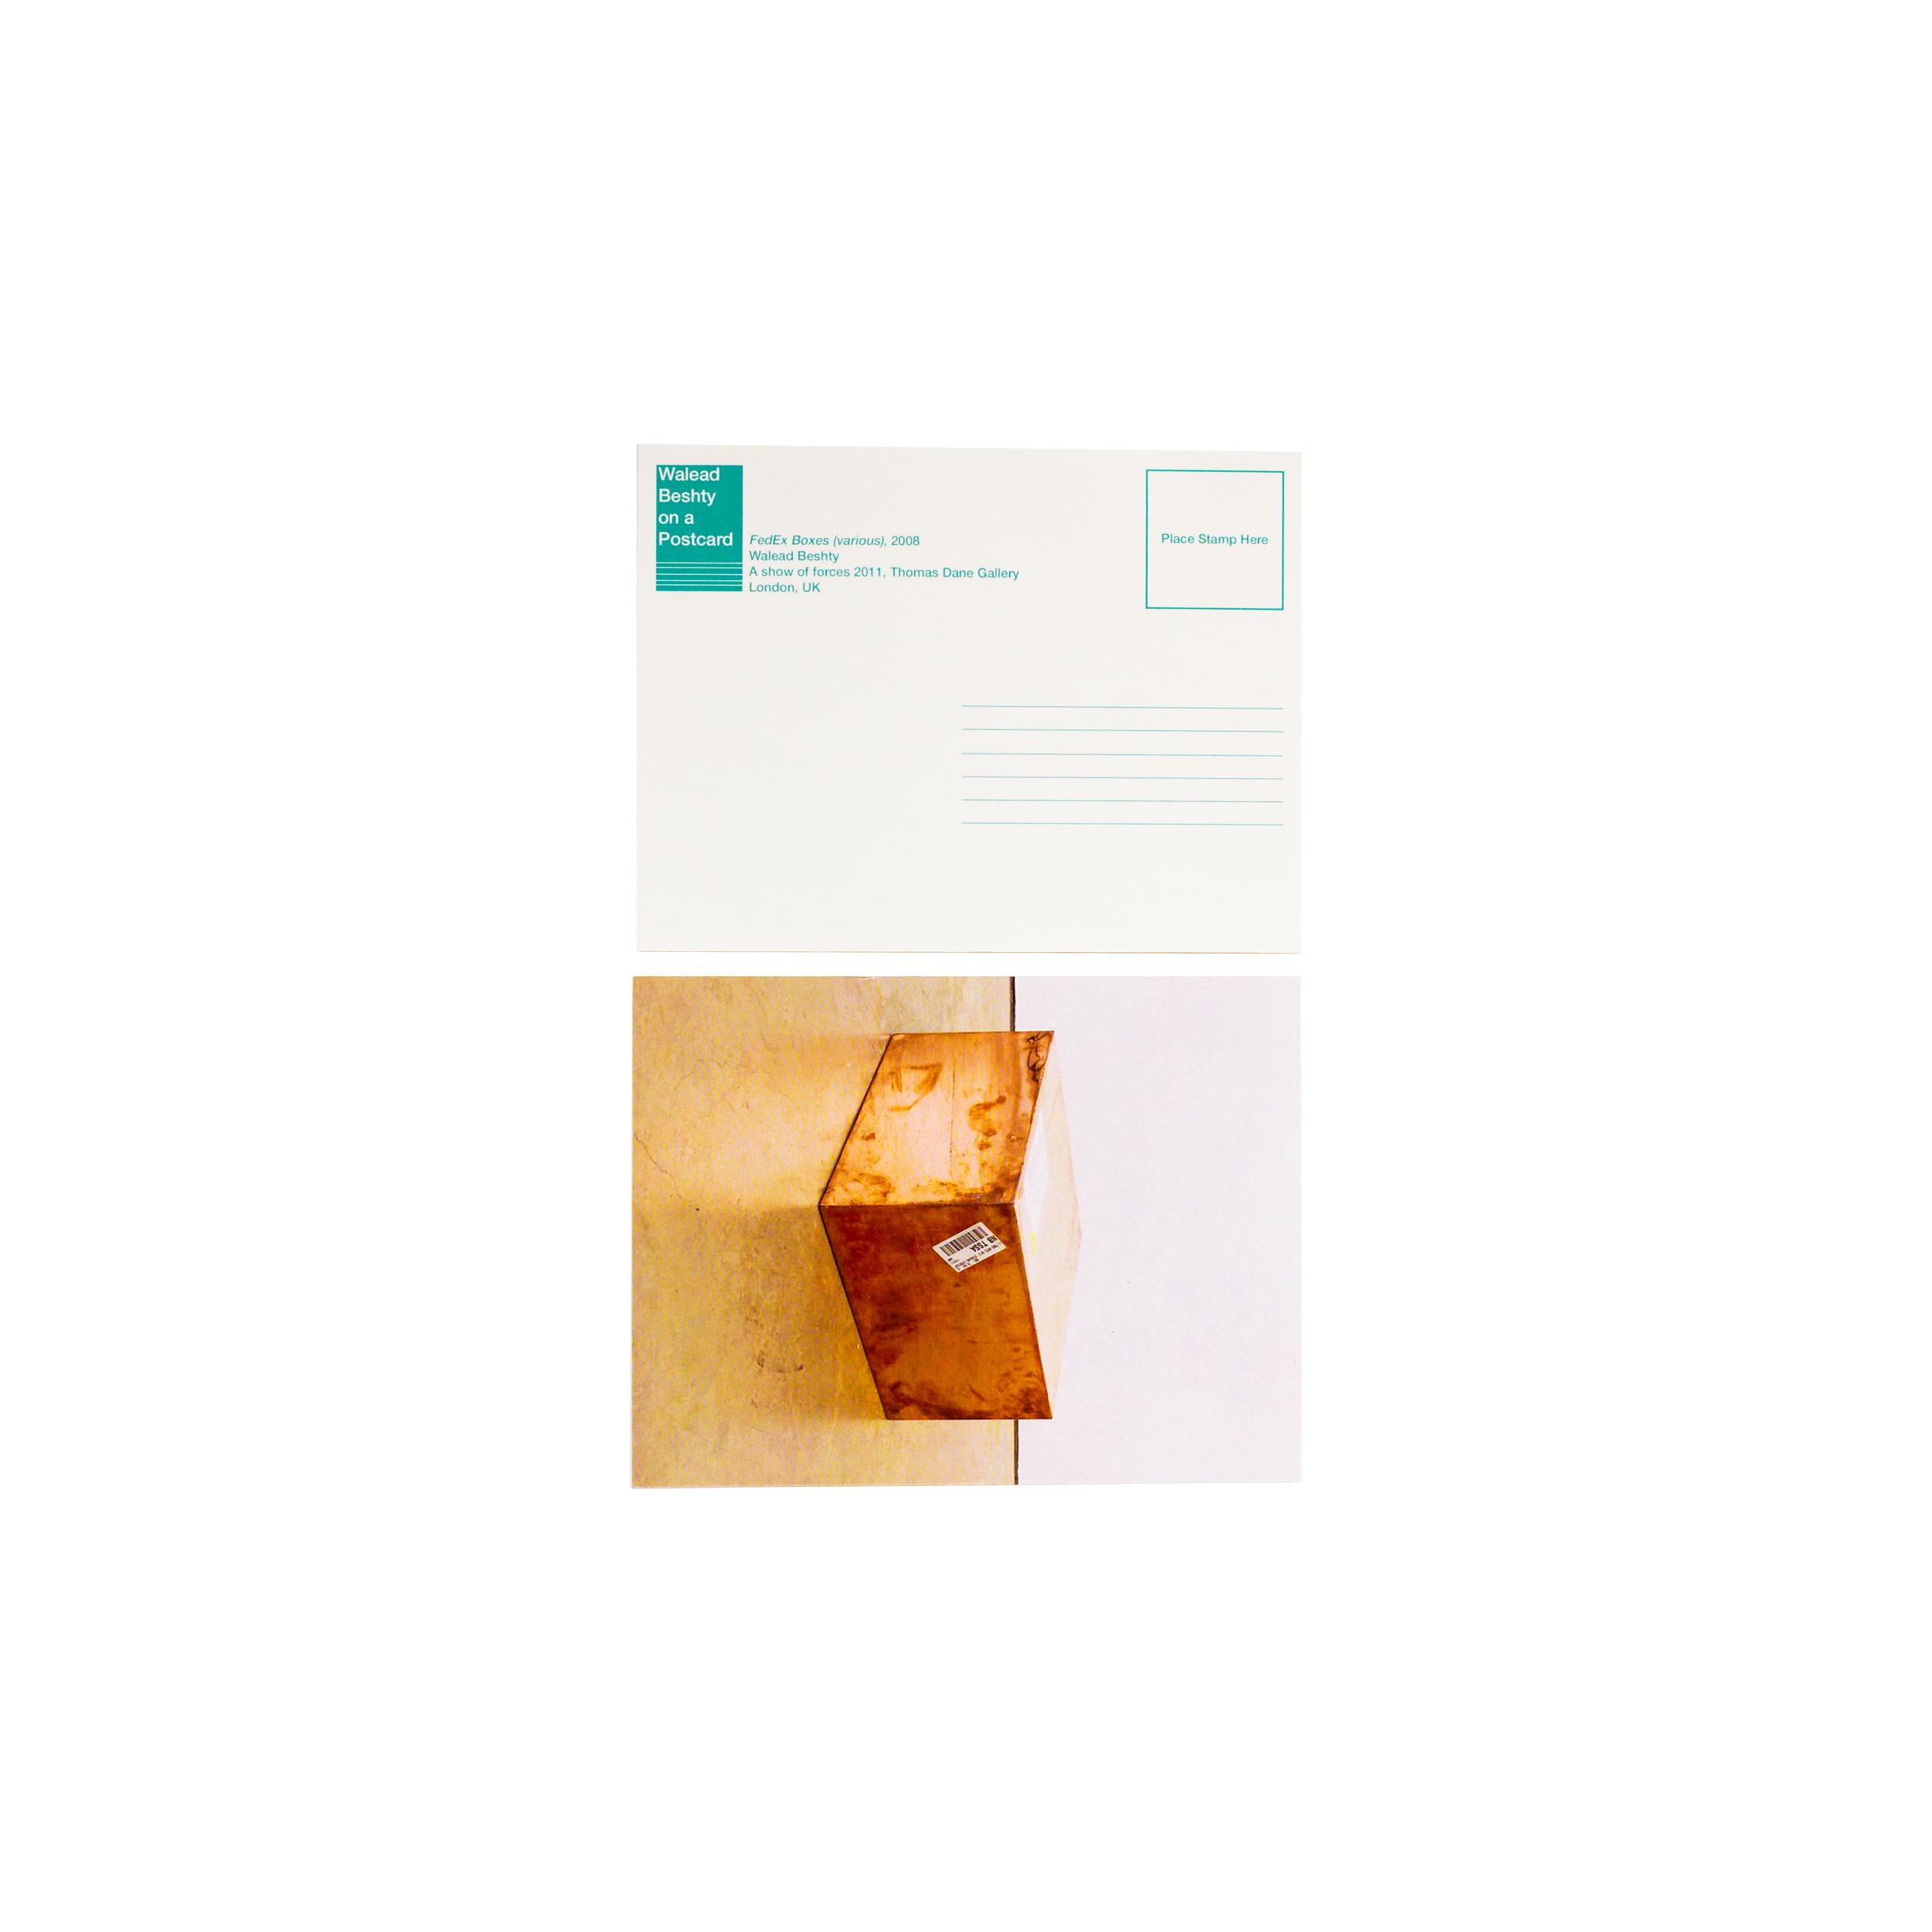 PSTCARD1616-REVISION2.jpg